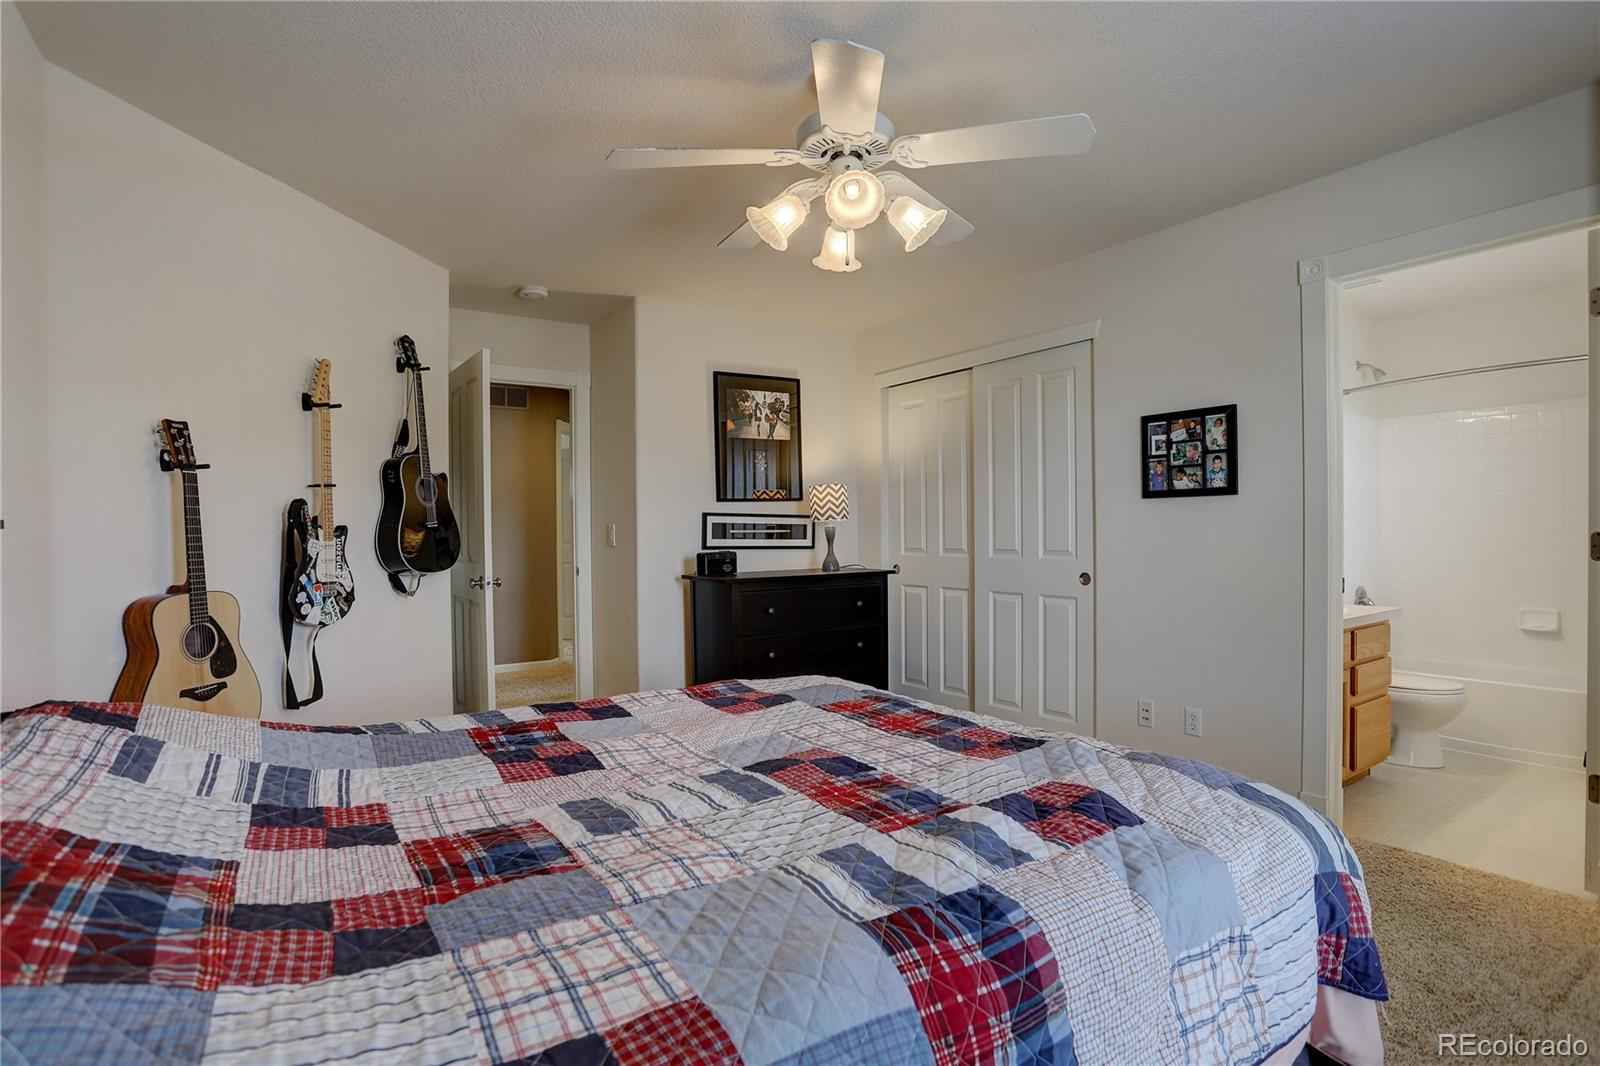 MLS# 3656997 - 21 - 10670 Addison Court, Highlands Ranch, CO 80126